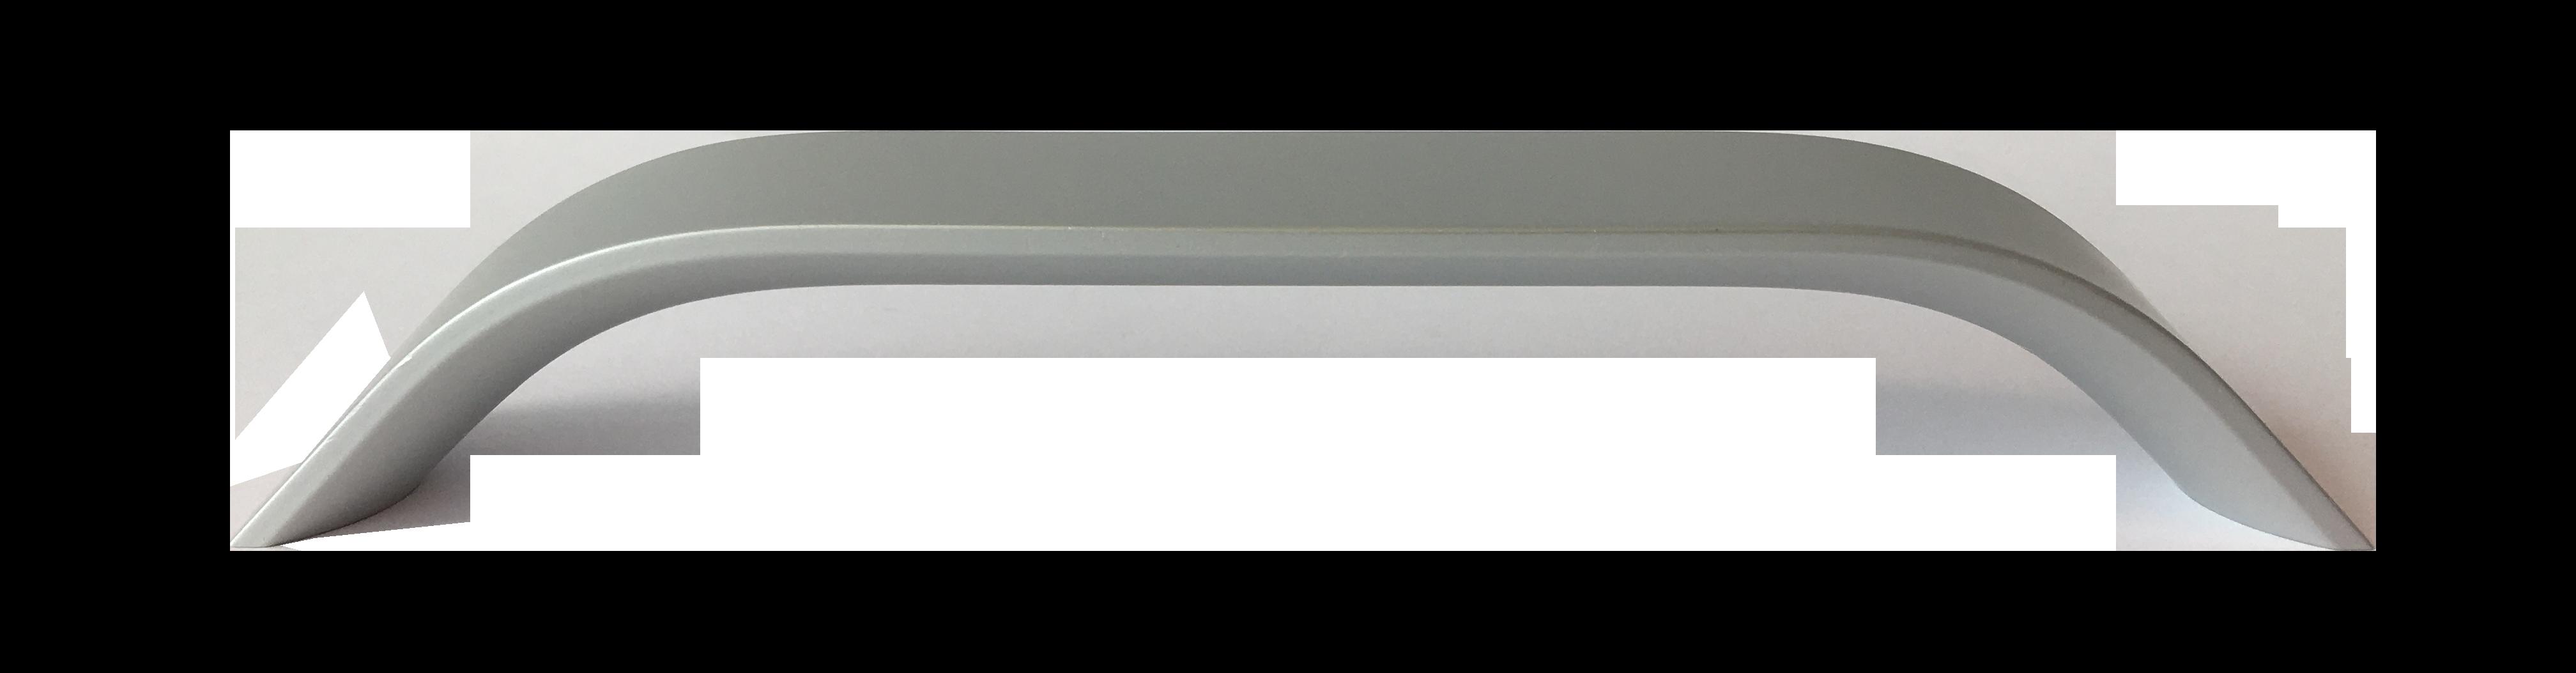 UA-00-337160 Side Angle for Kitchen Cabinets